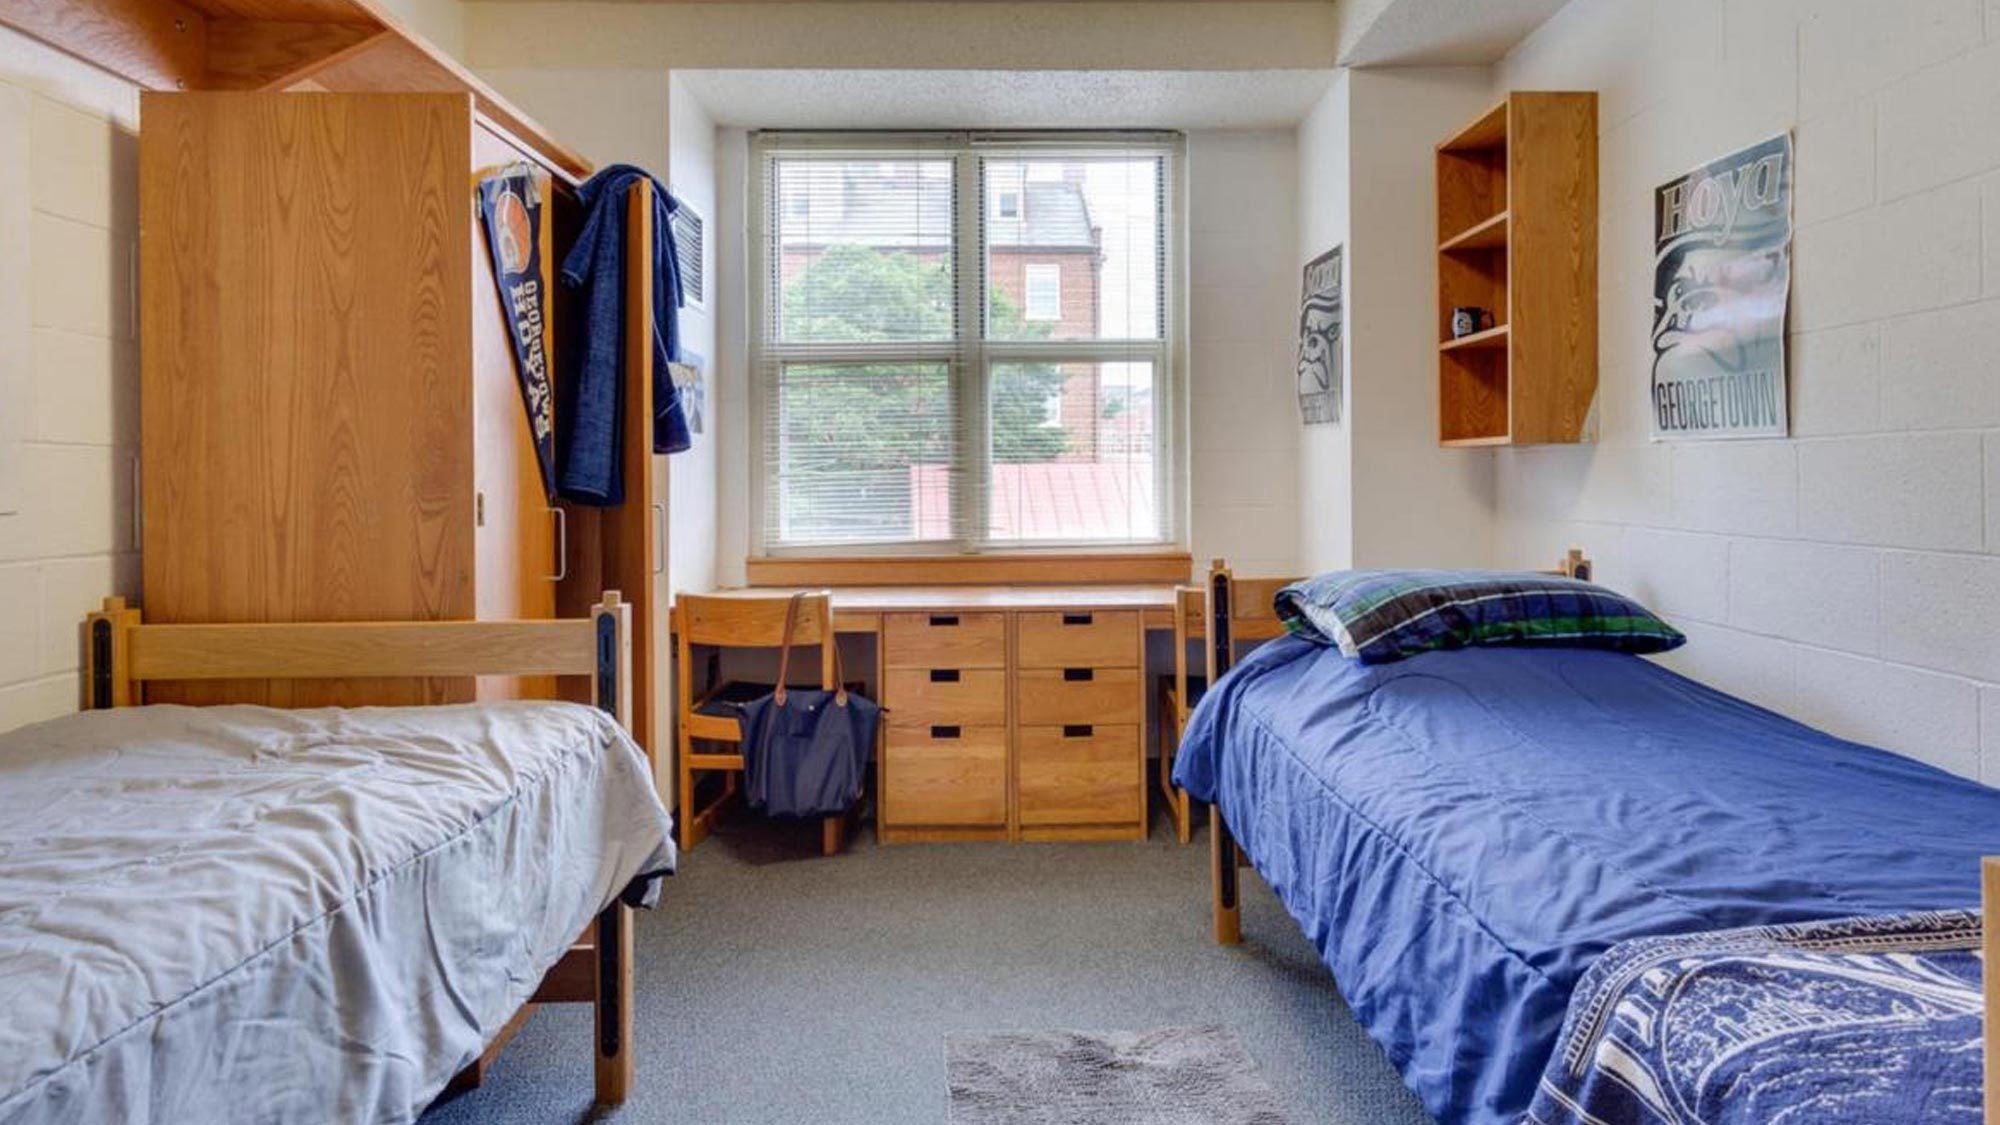 An undergraduate double-occupancy dorm room.